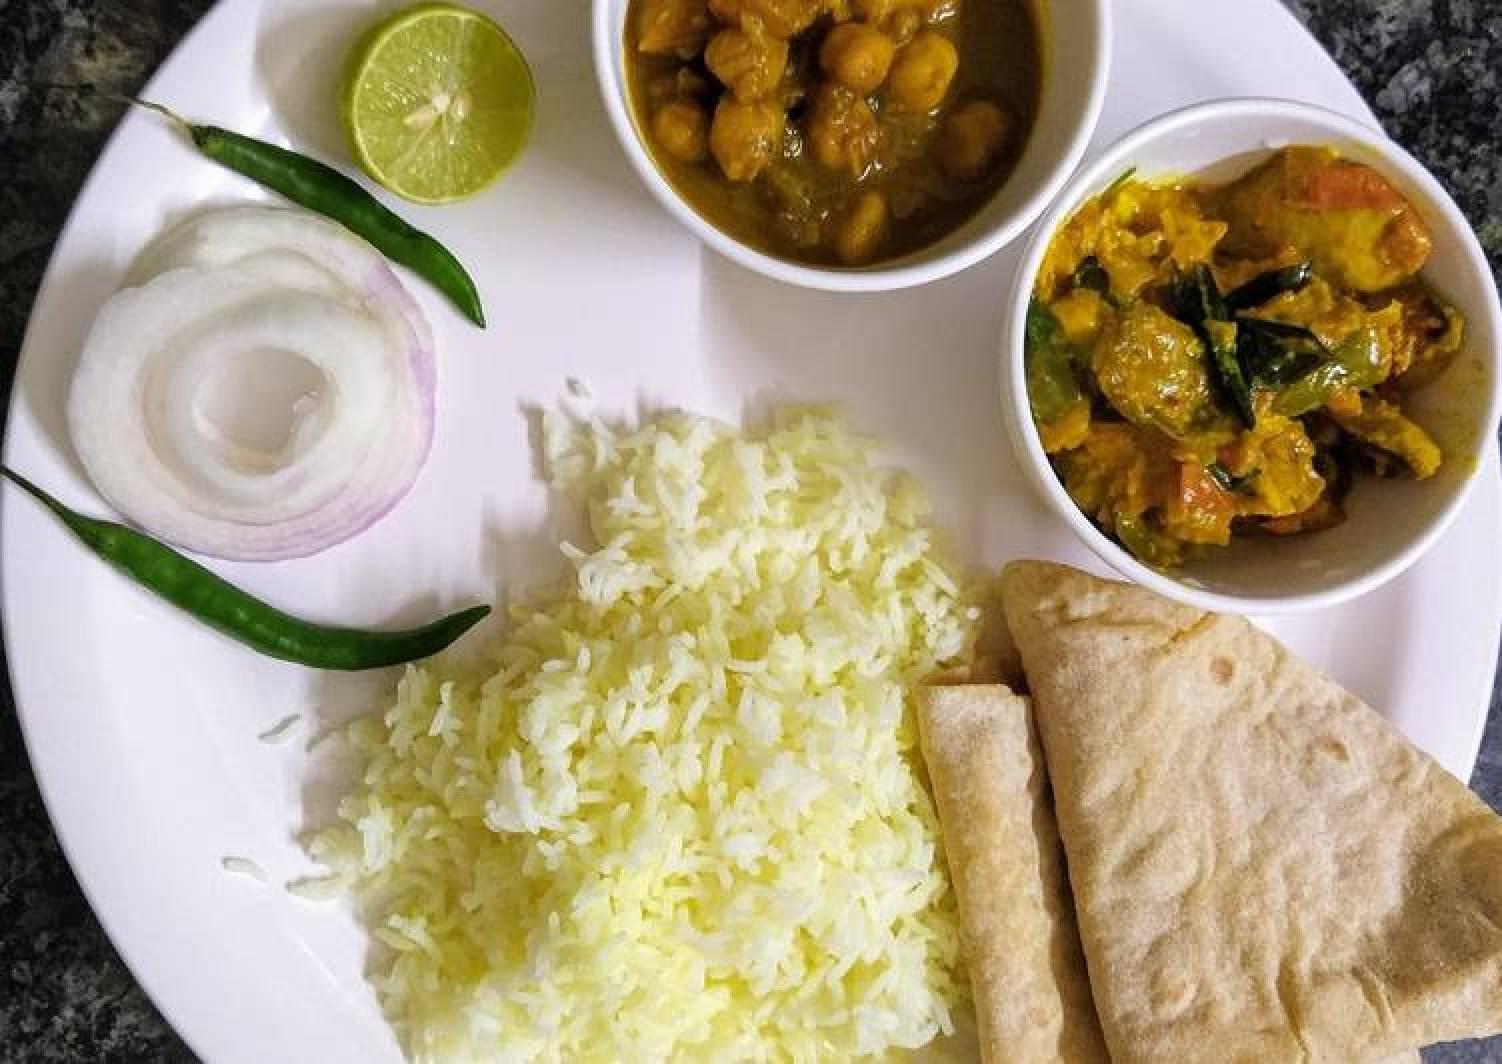 Veg lunch thali with rice, chhole, mushroom masala and chapati